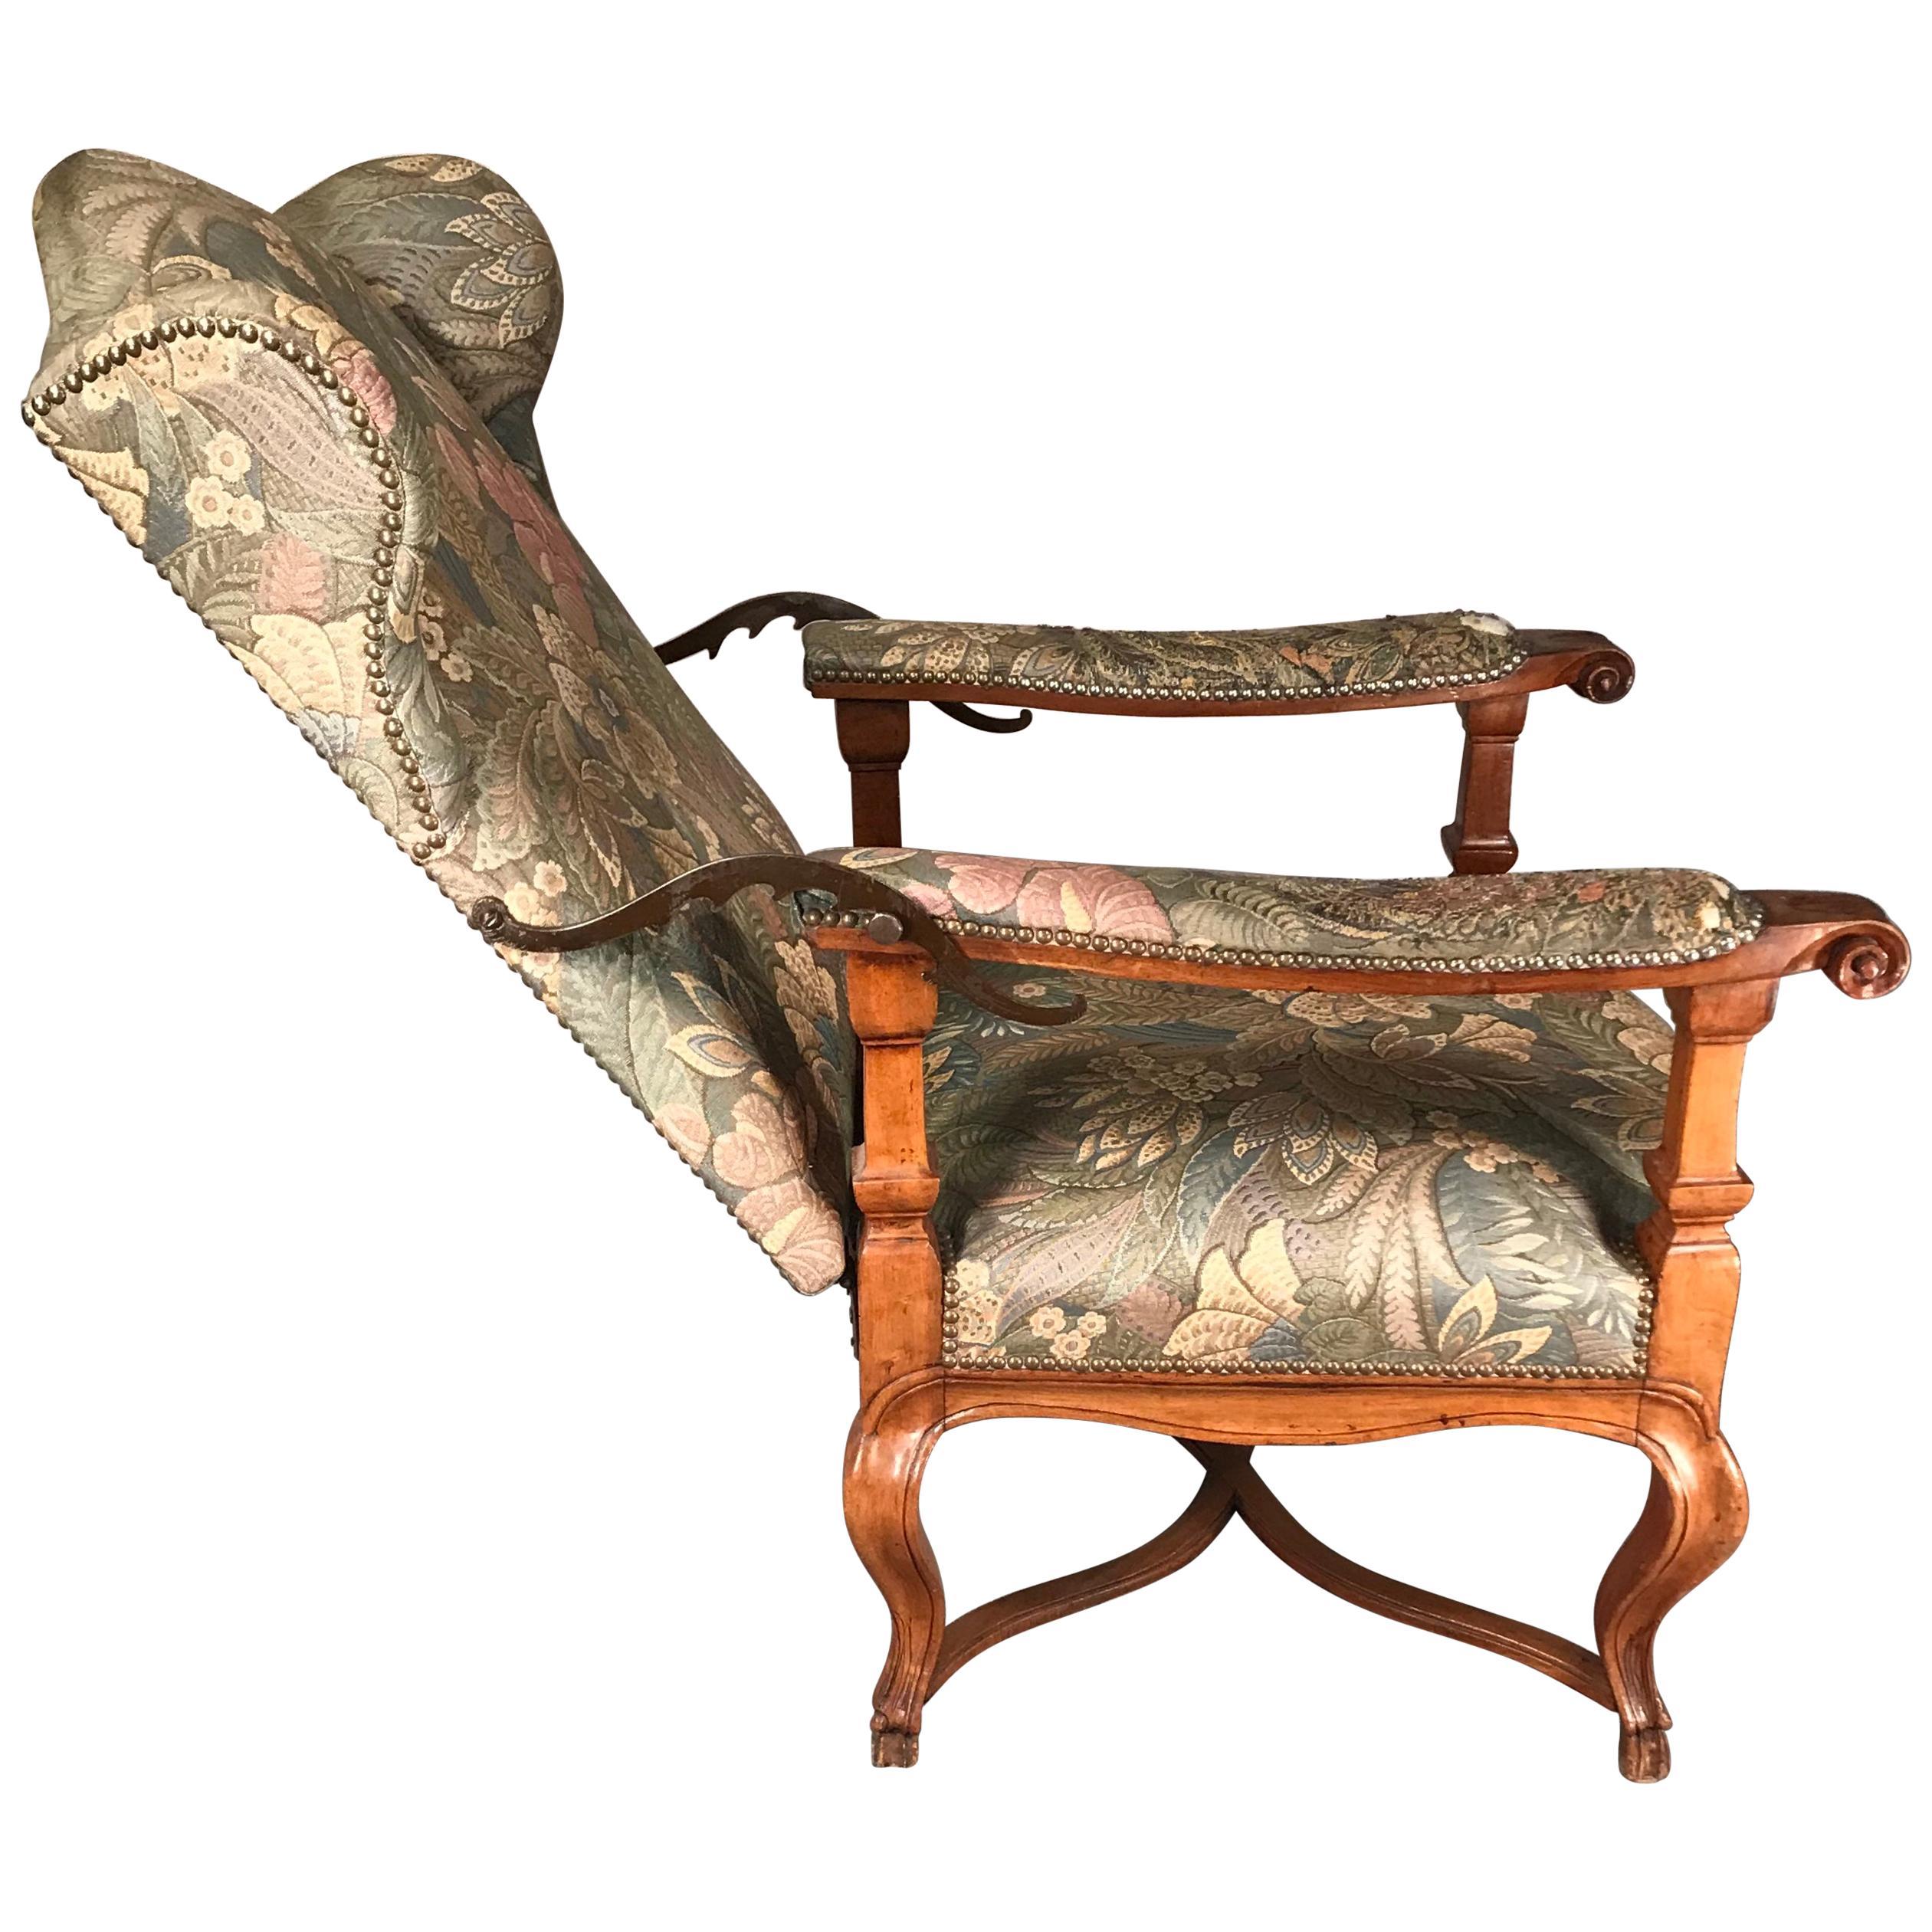 Reclining Baroque Wingback Chair, Germany 18th Century, Walnut